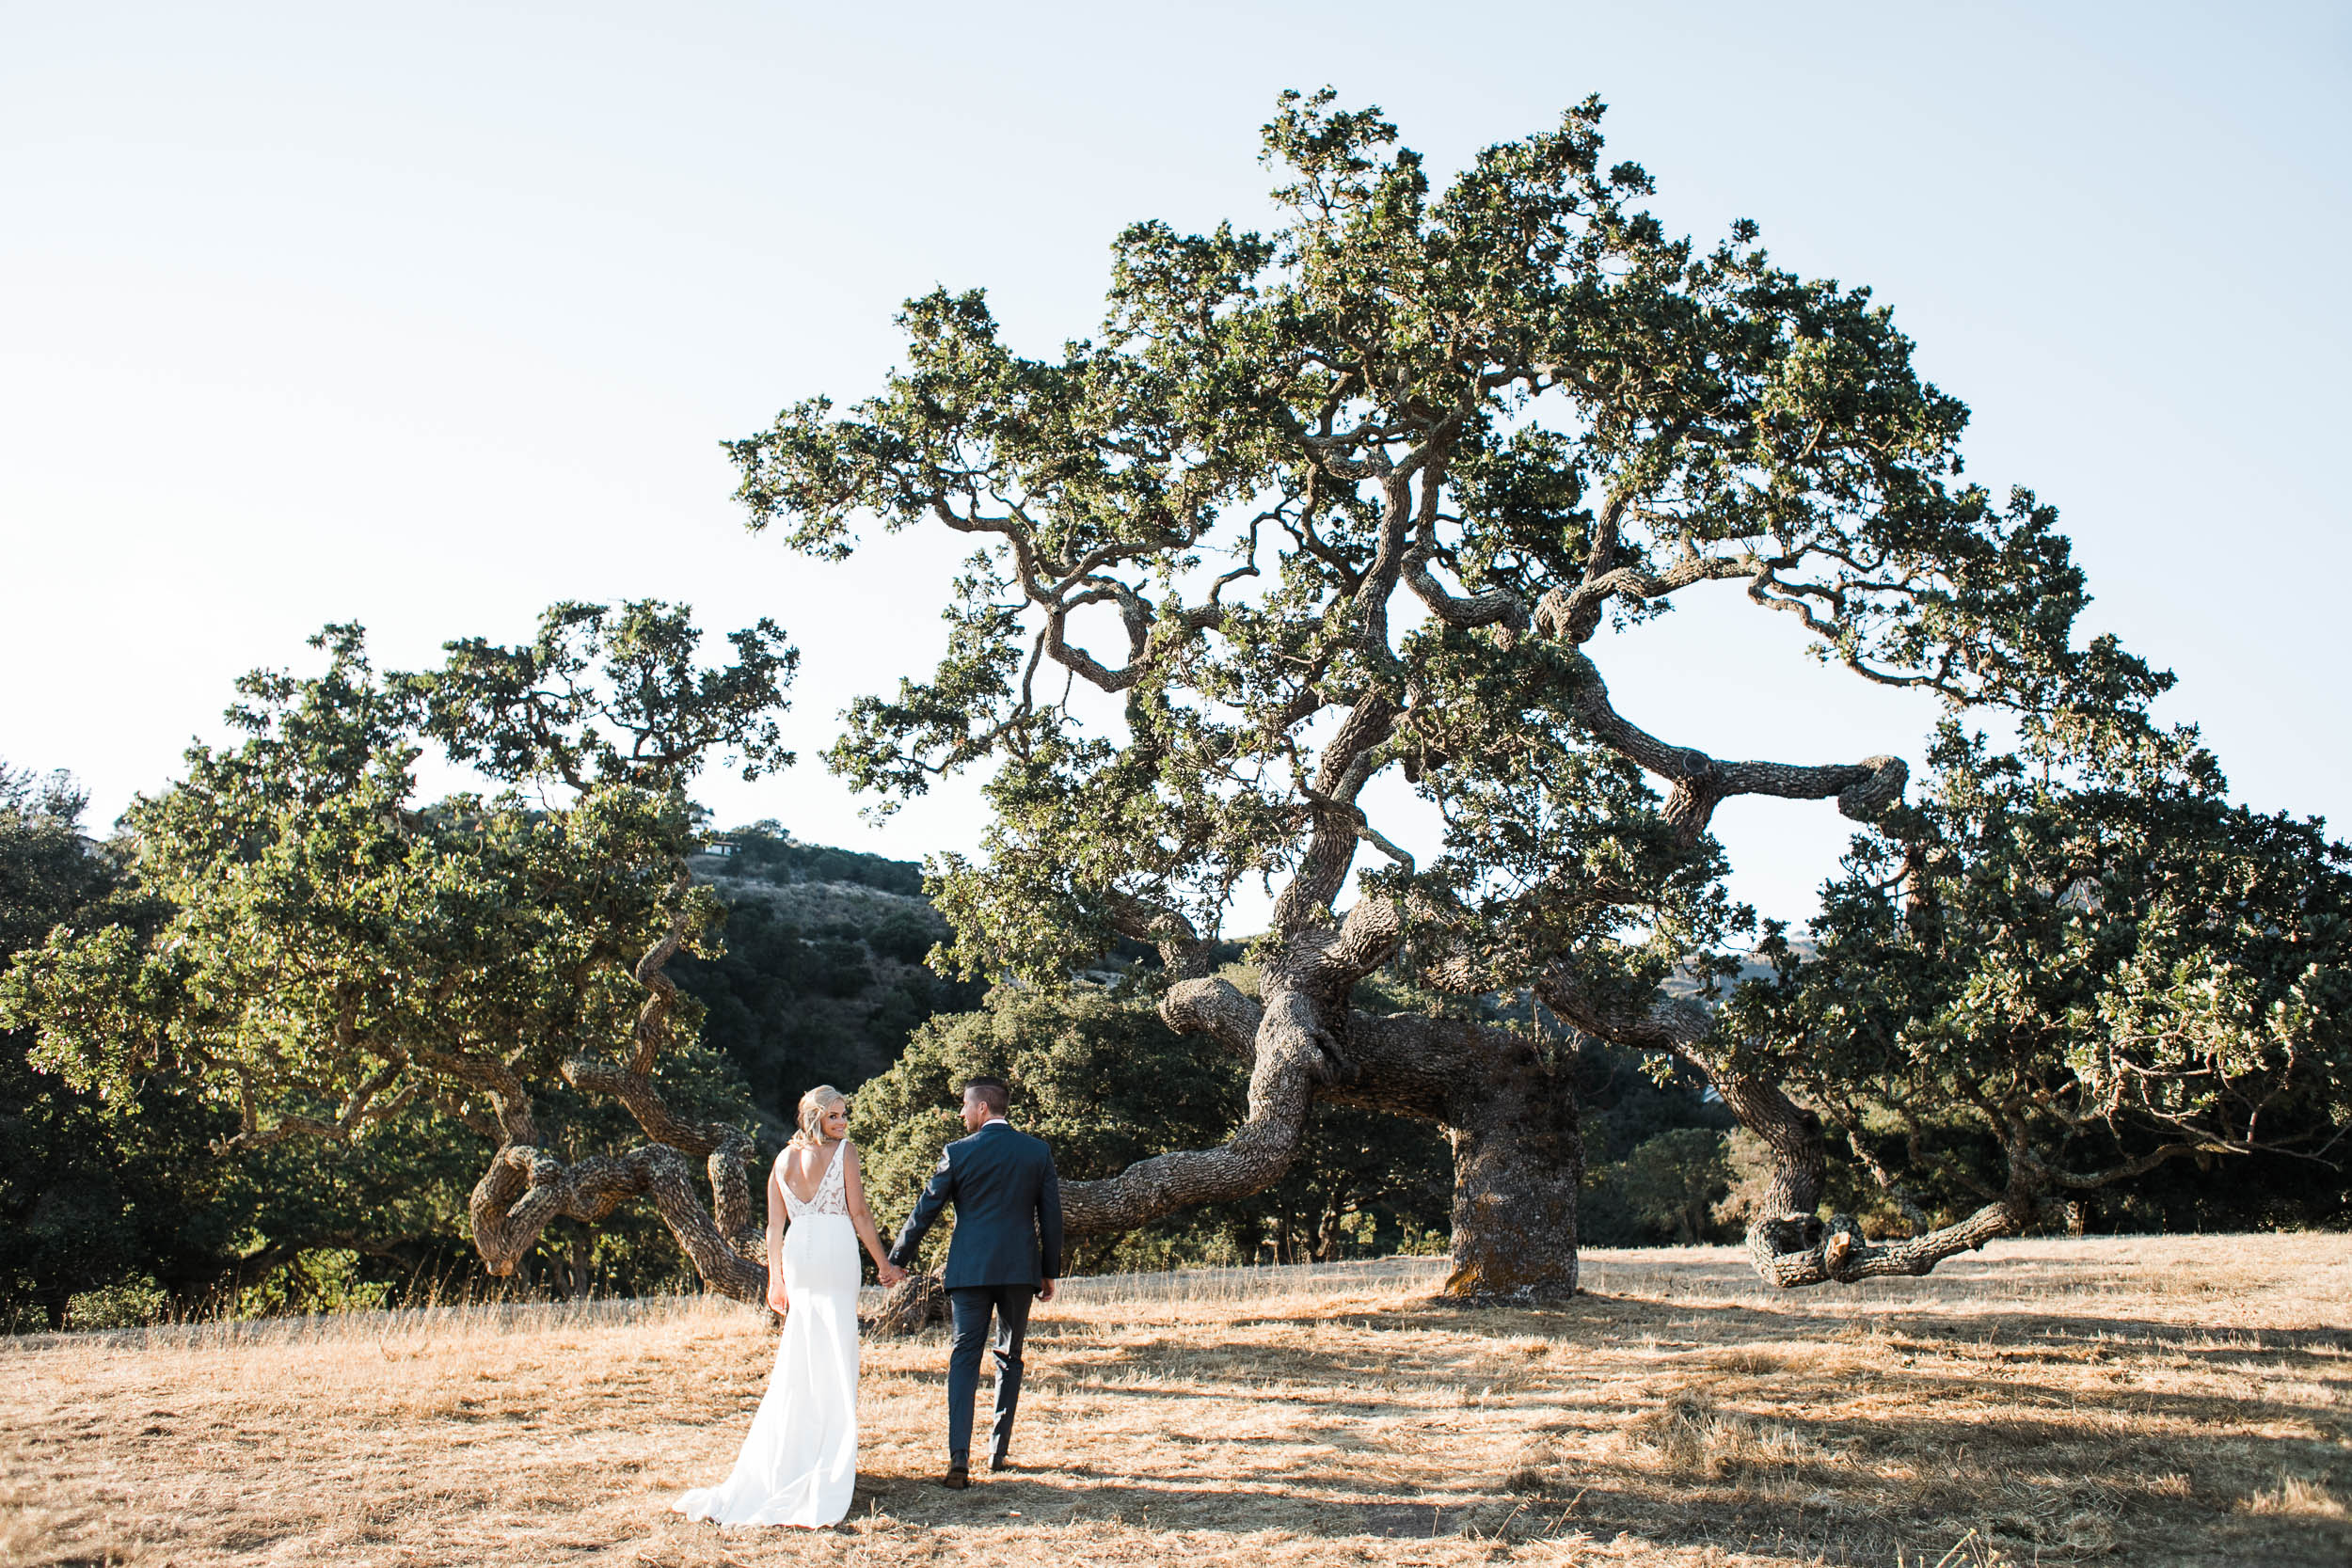 114_072118_D+K_Holman Ranch Wedding_Buena Lane Photography_1271ER.jpg